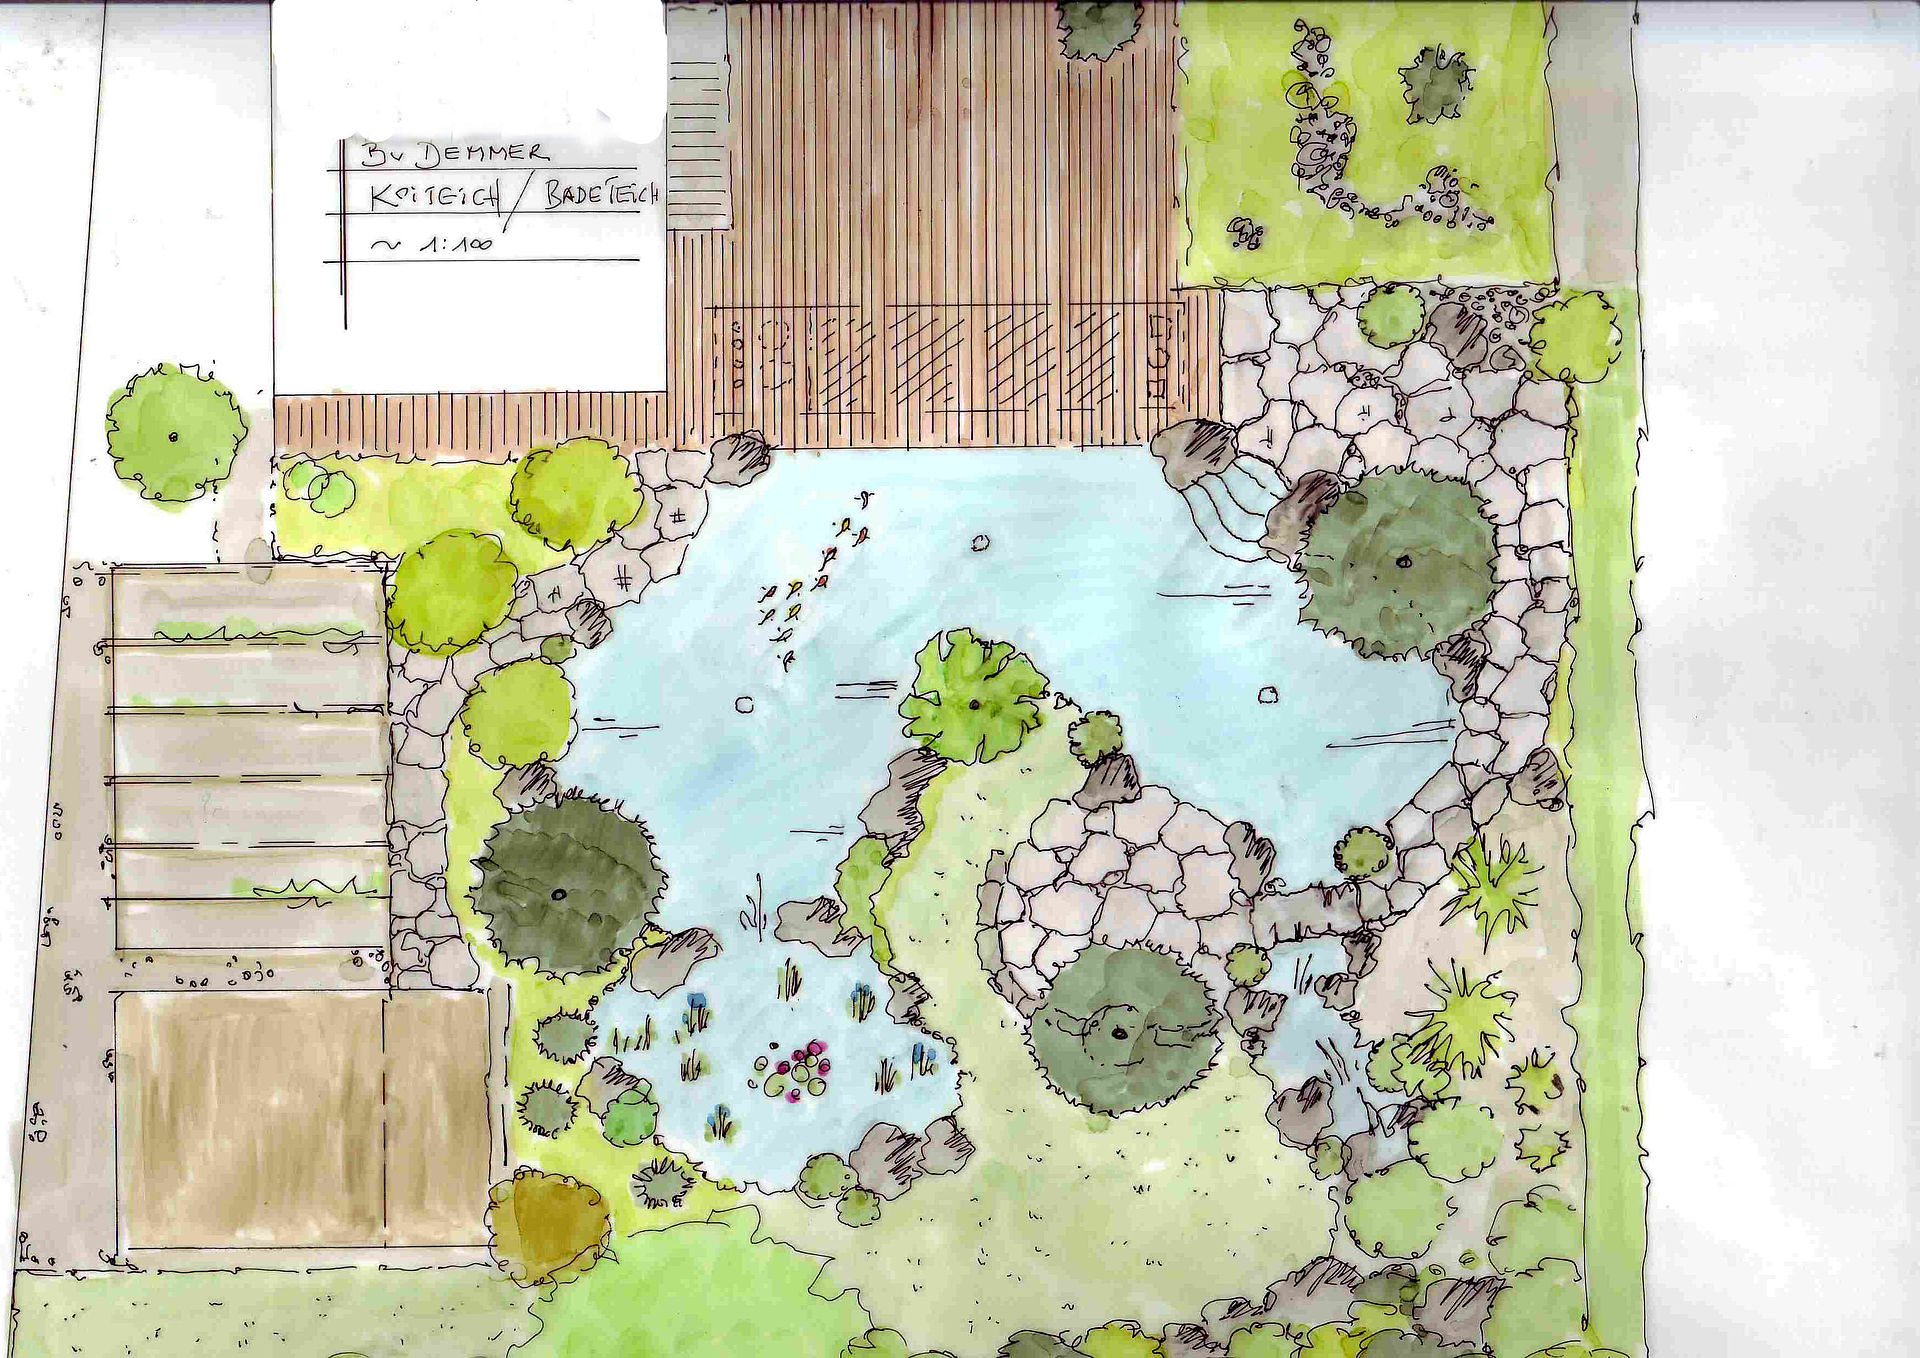 Landschaftsarchitektur Garten Skizze Emejing ...